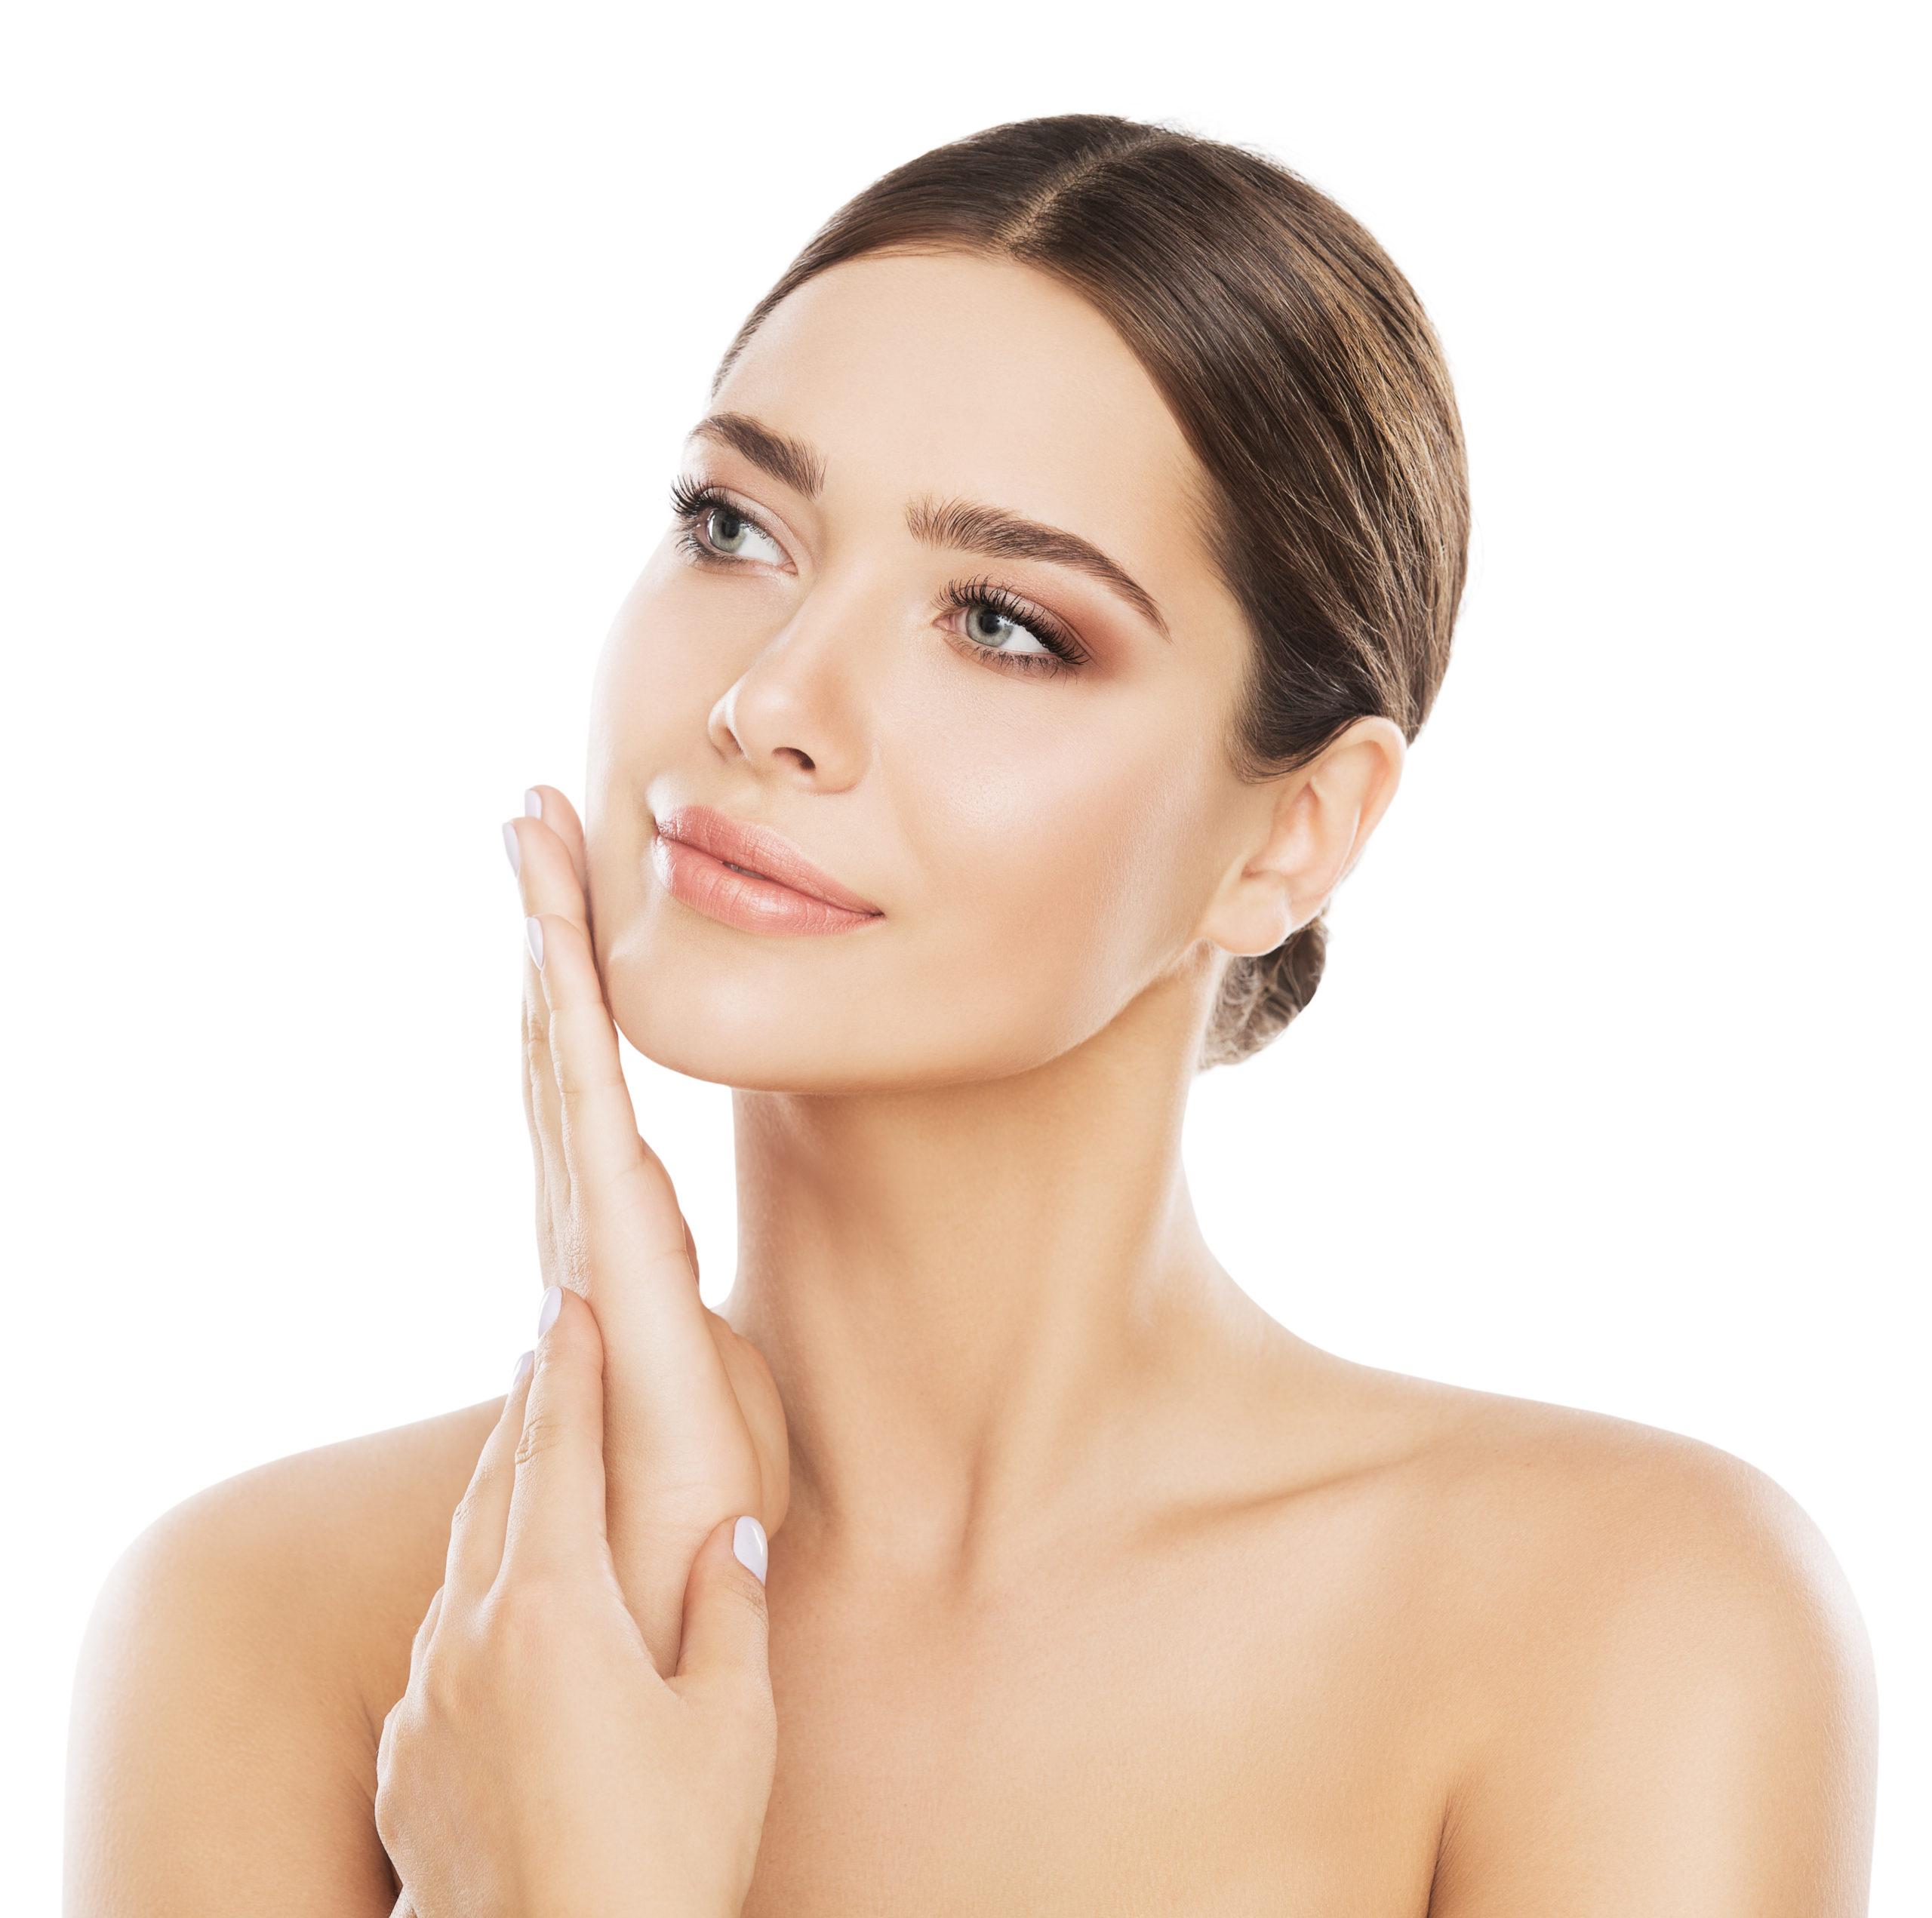 Gesunde Haut, Haare und Nägel